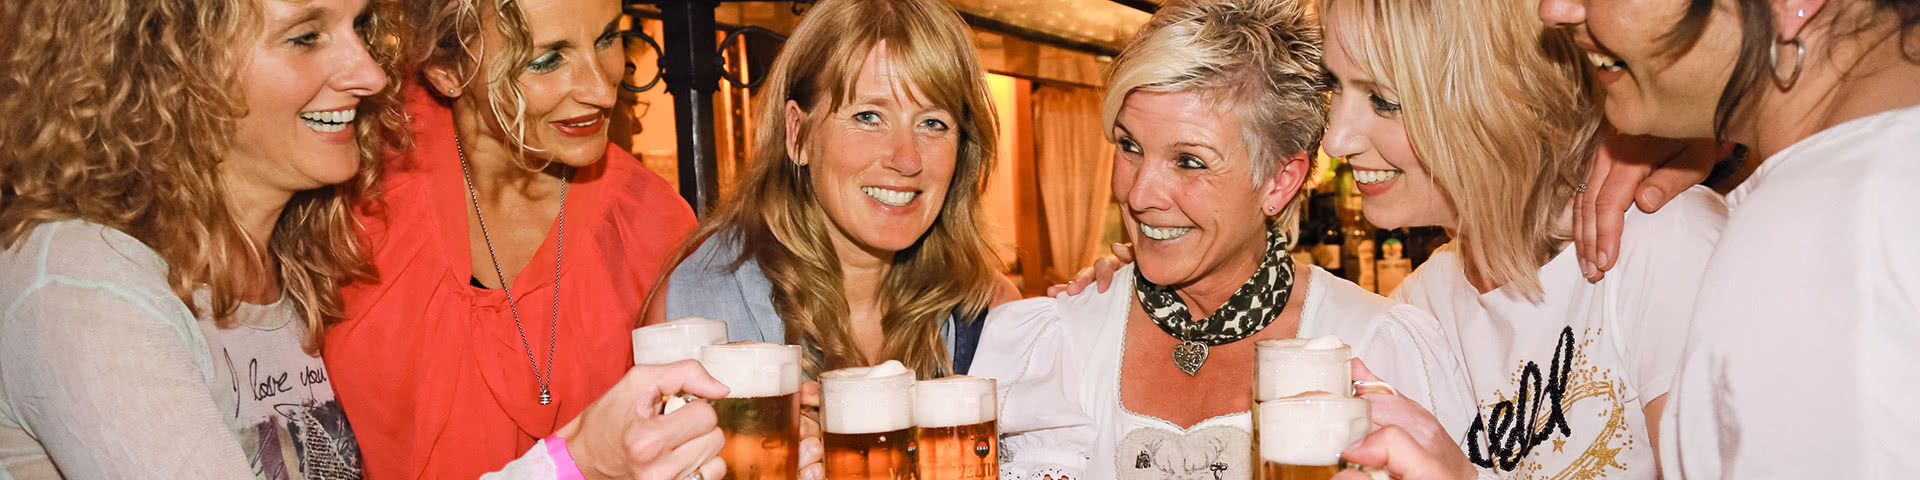 Frauengruppe trinkt gemeinsam Bier in Willingen